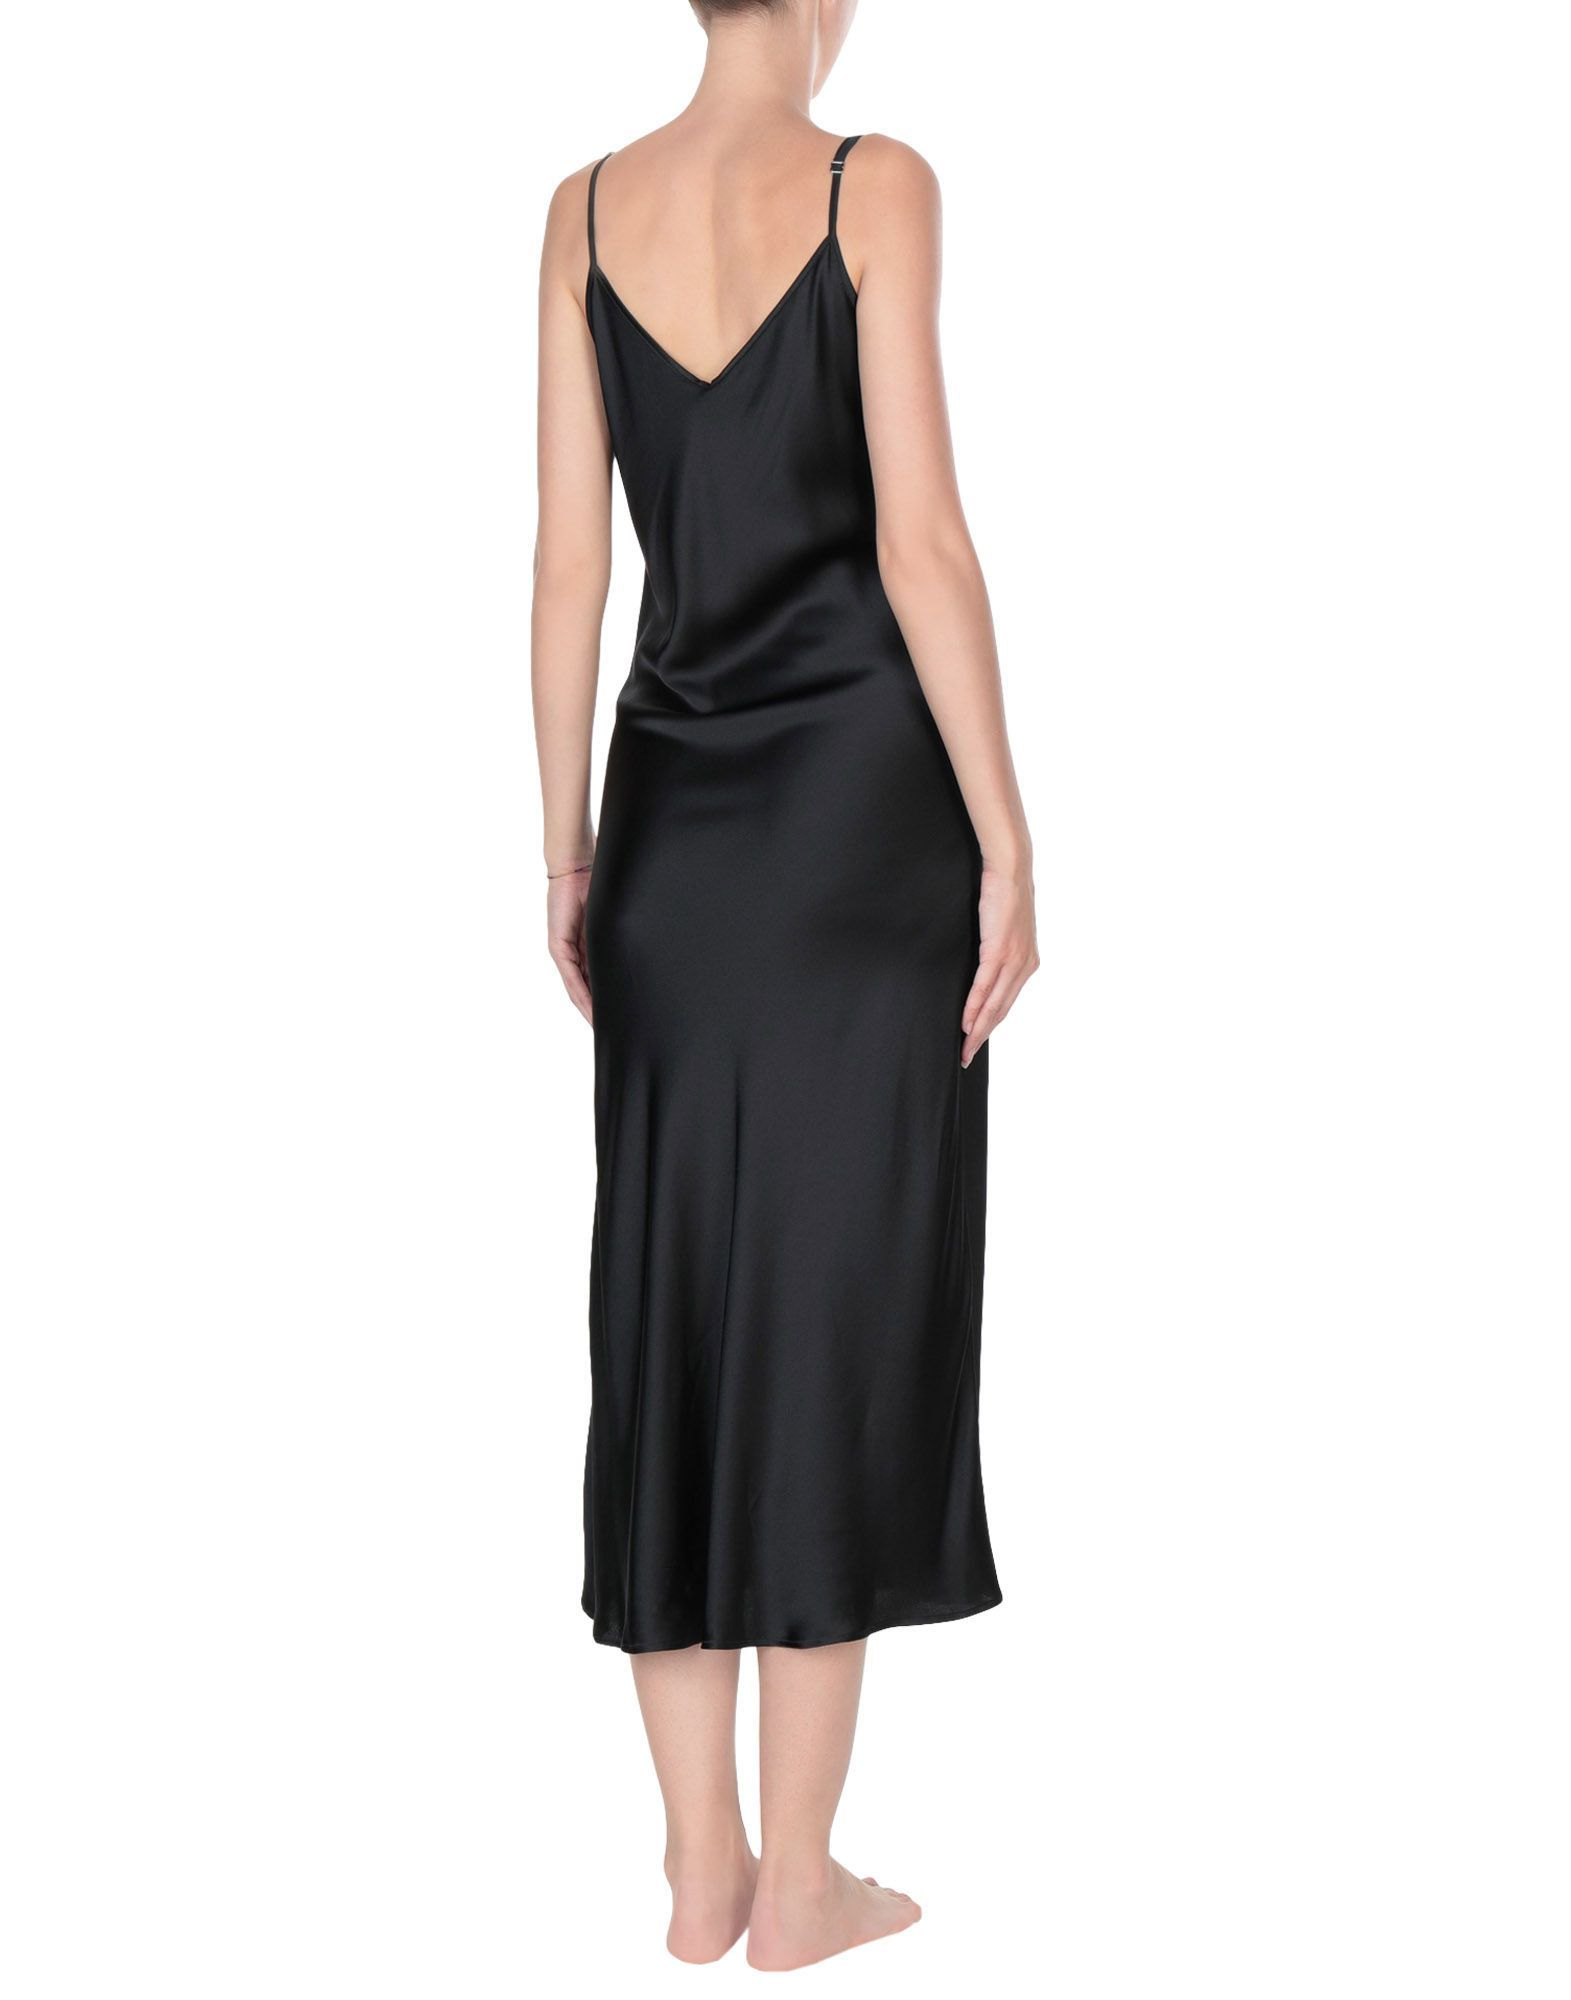 UNDERWEAR Woman Christies Black Silk